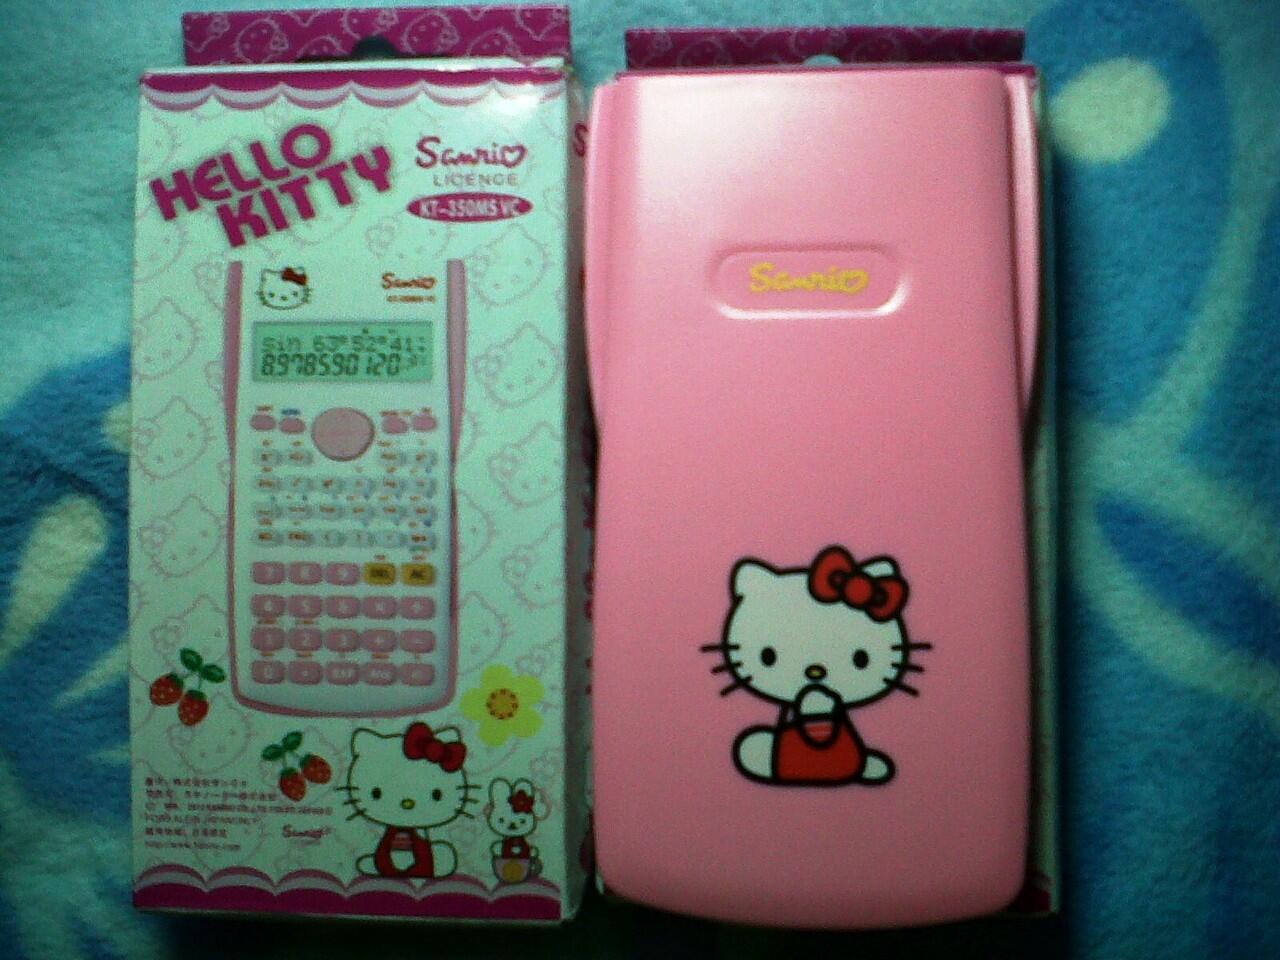 Kalkulator Scientific Hello Kitty 350